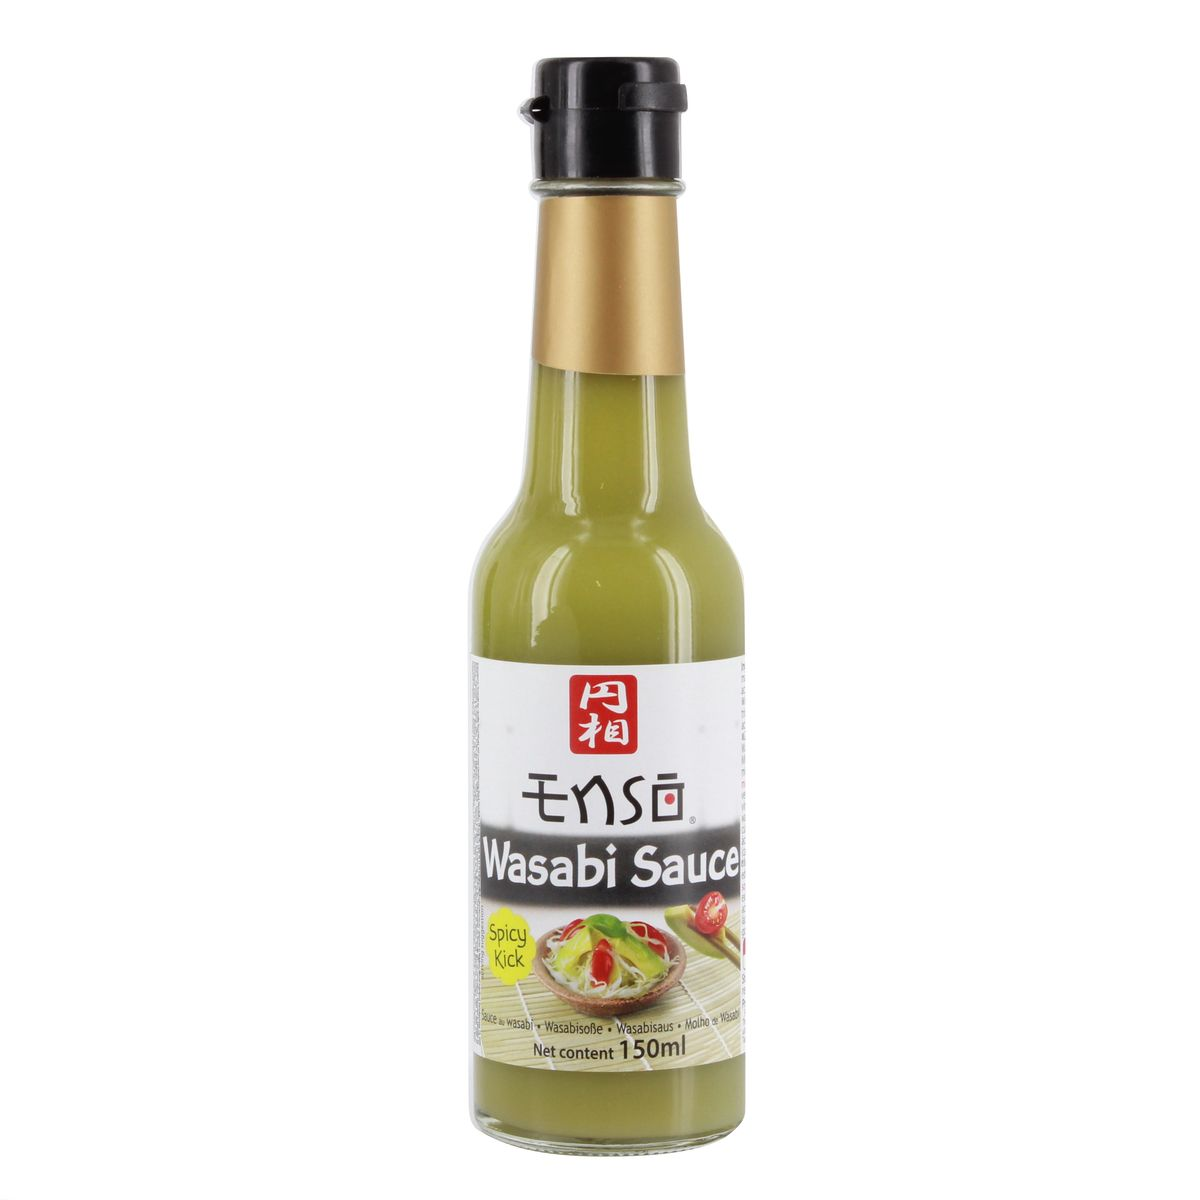 Wasabi sauce - Enso